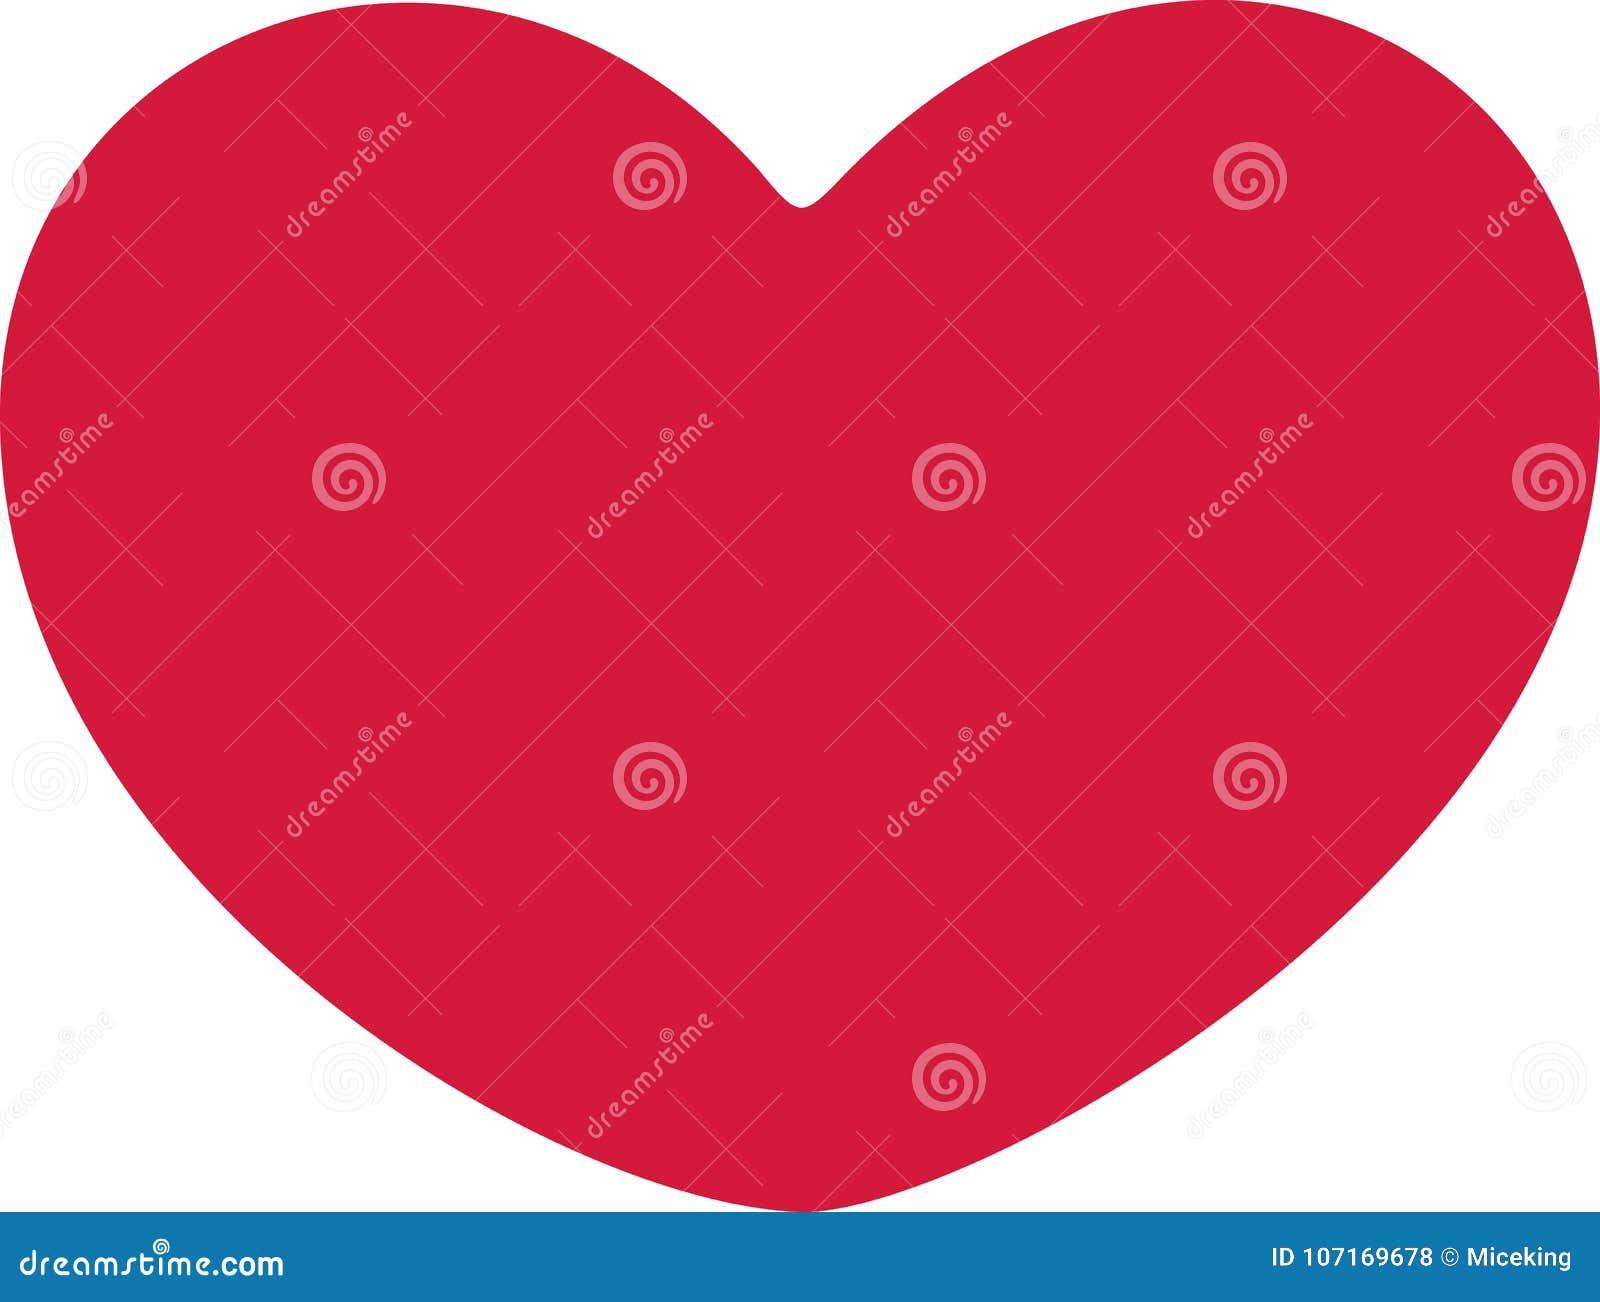 Round heart vector